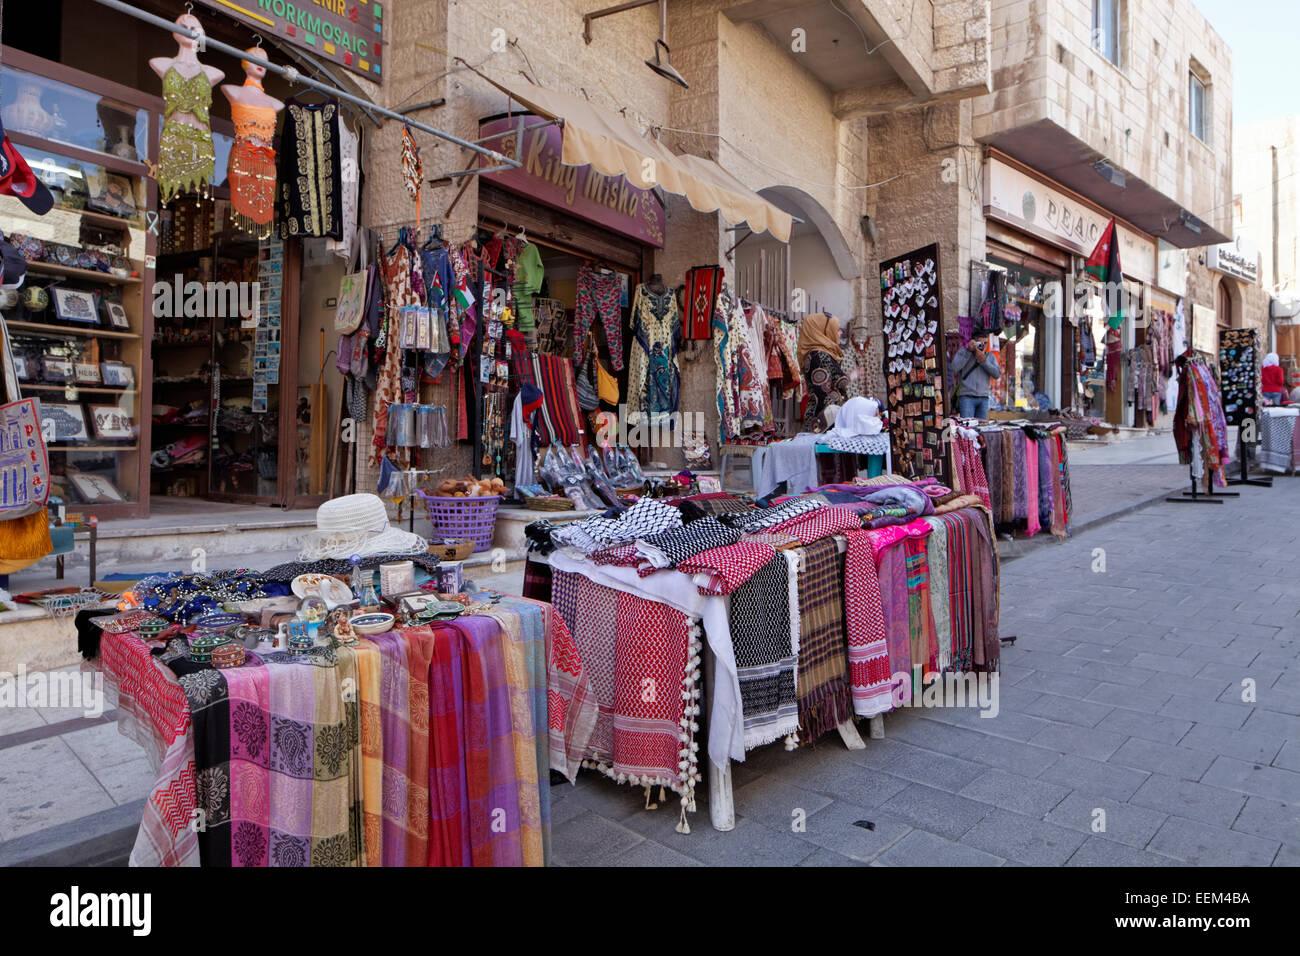 Souvenir shop, Madaba, Jordan - Stock Image